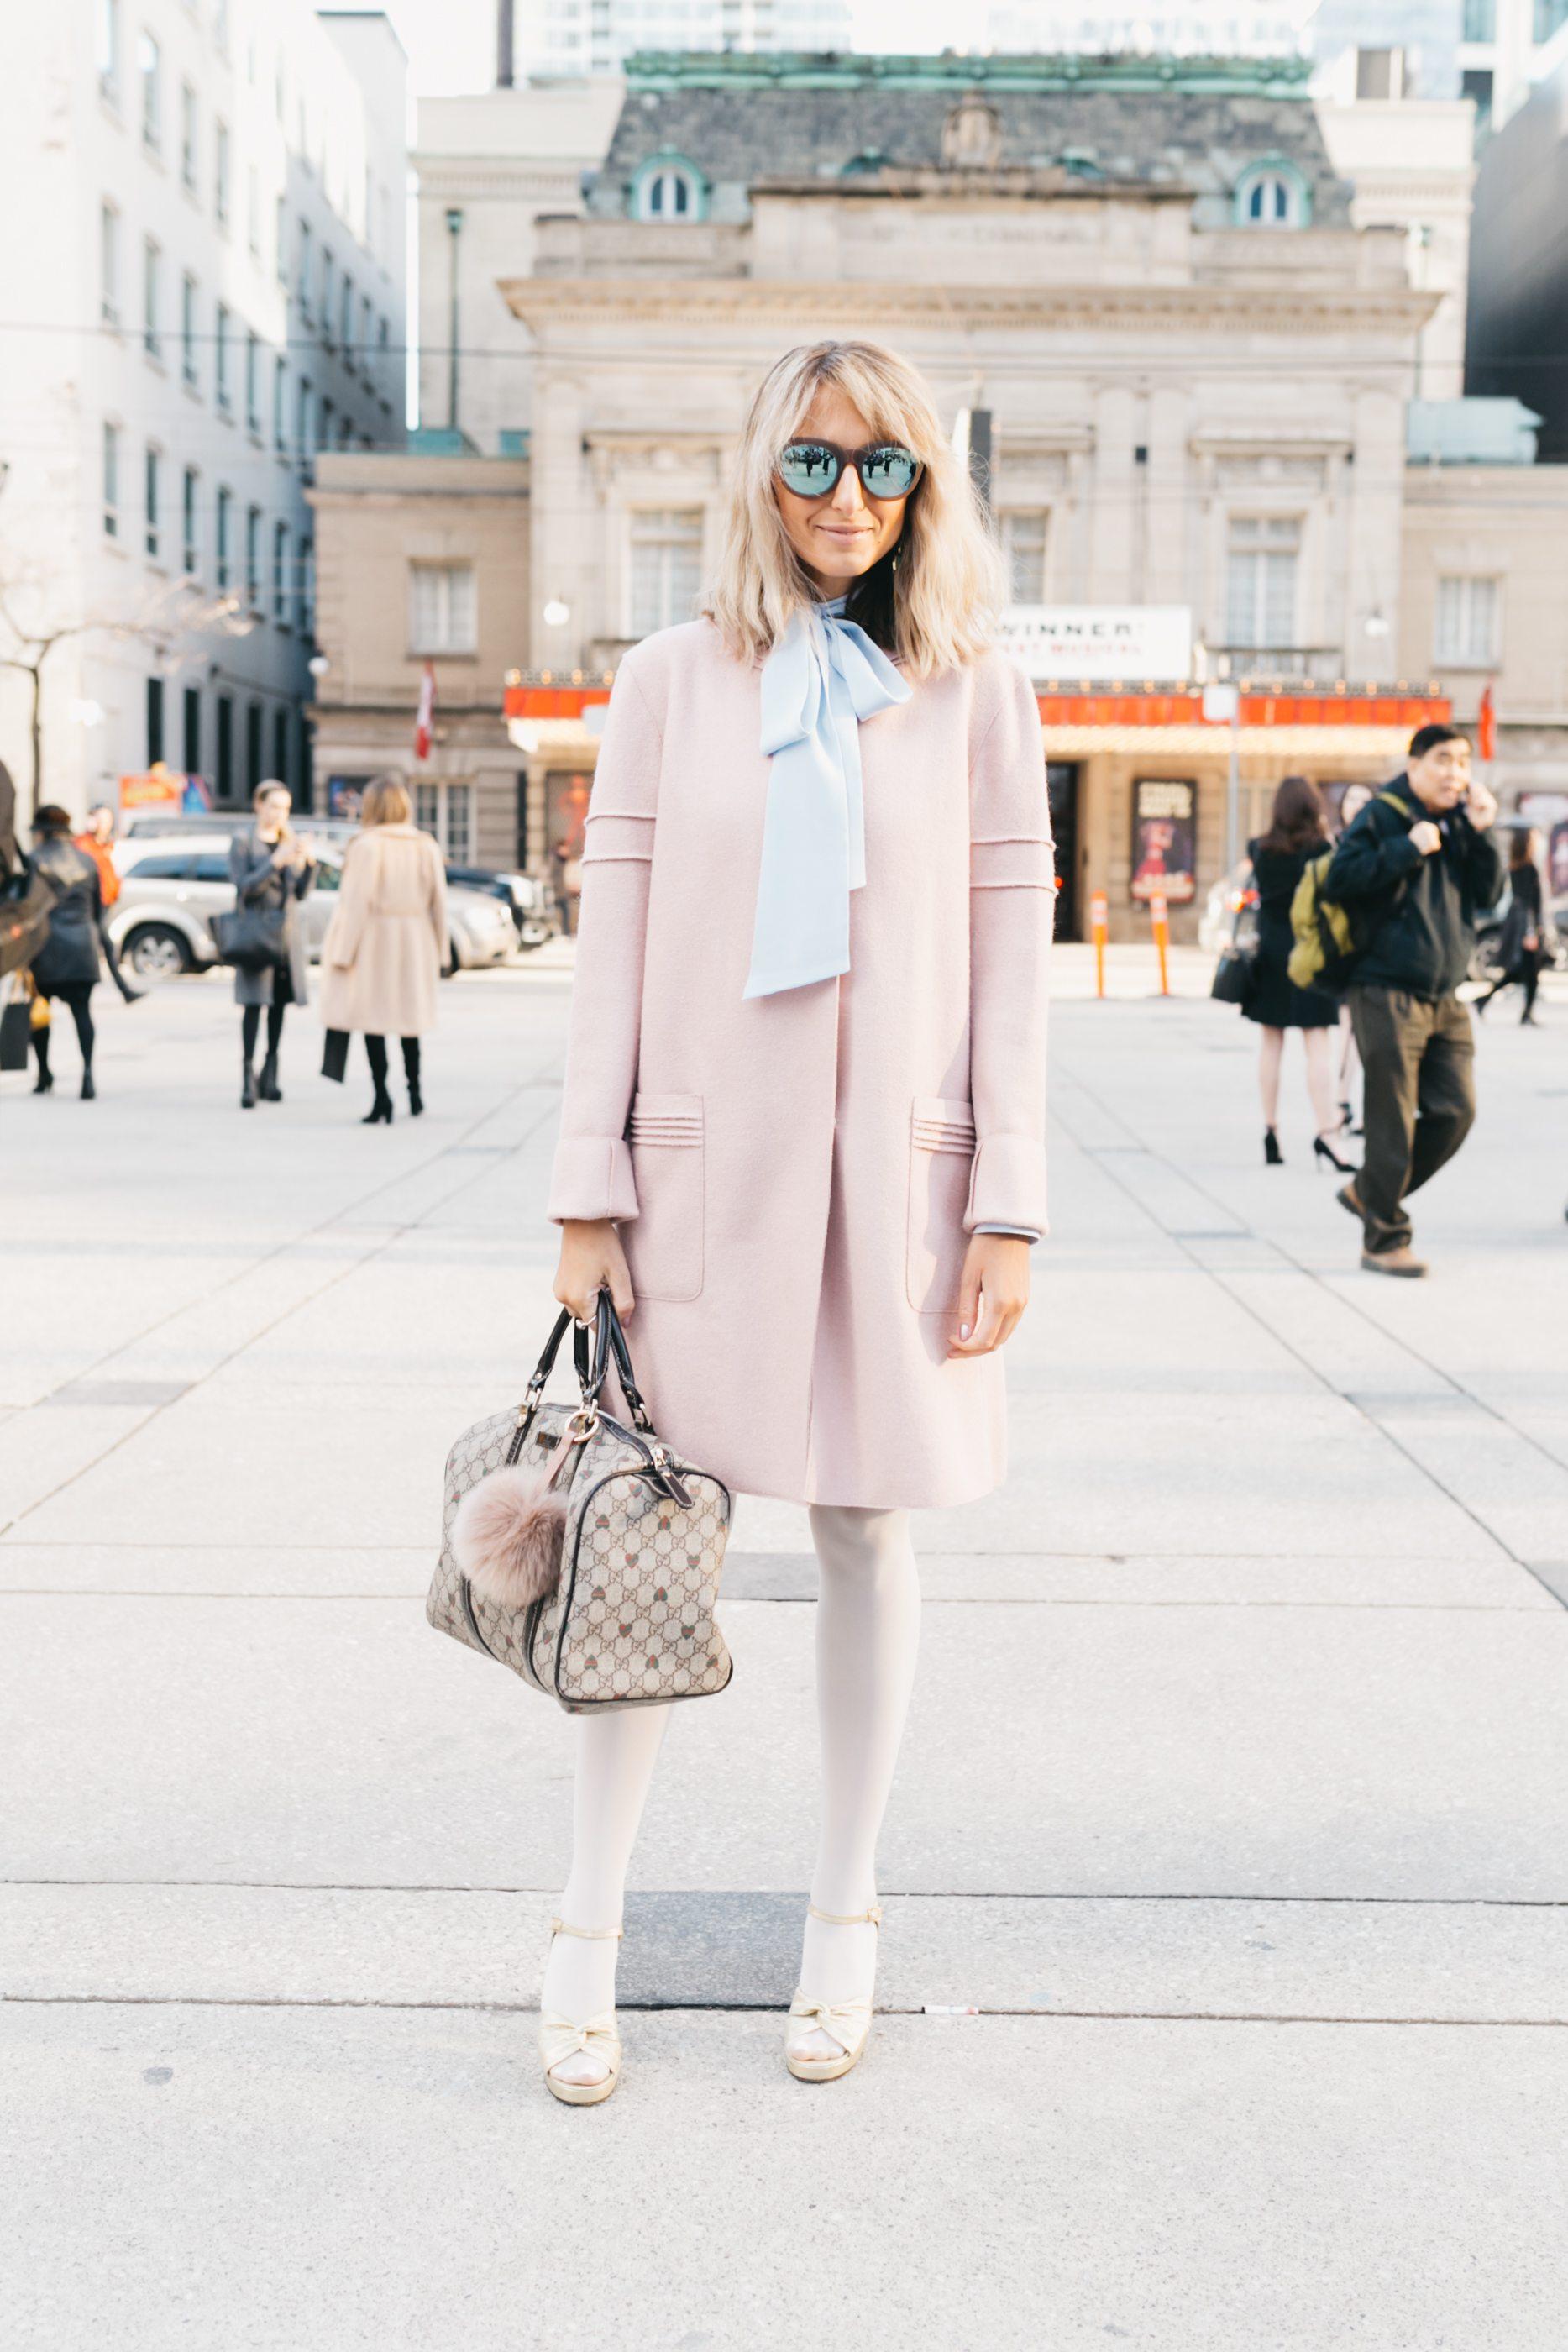 fashionweek_day2_streetstyle_krocca-6710